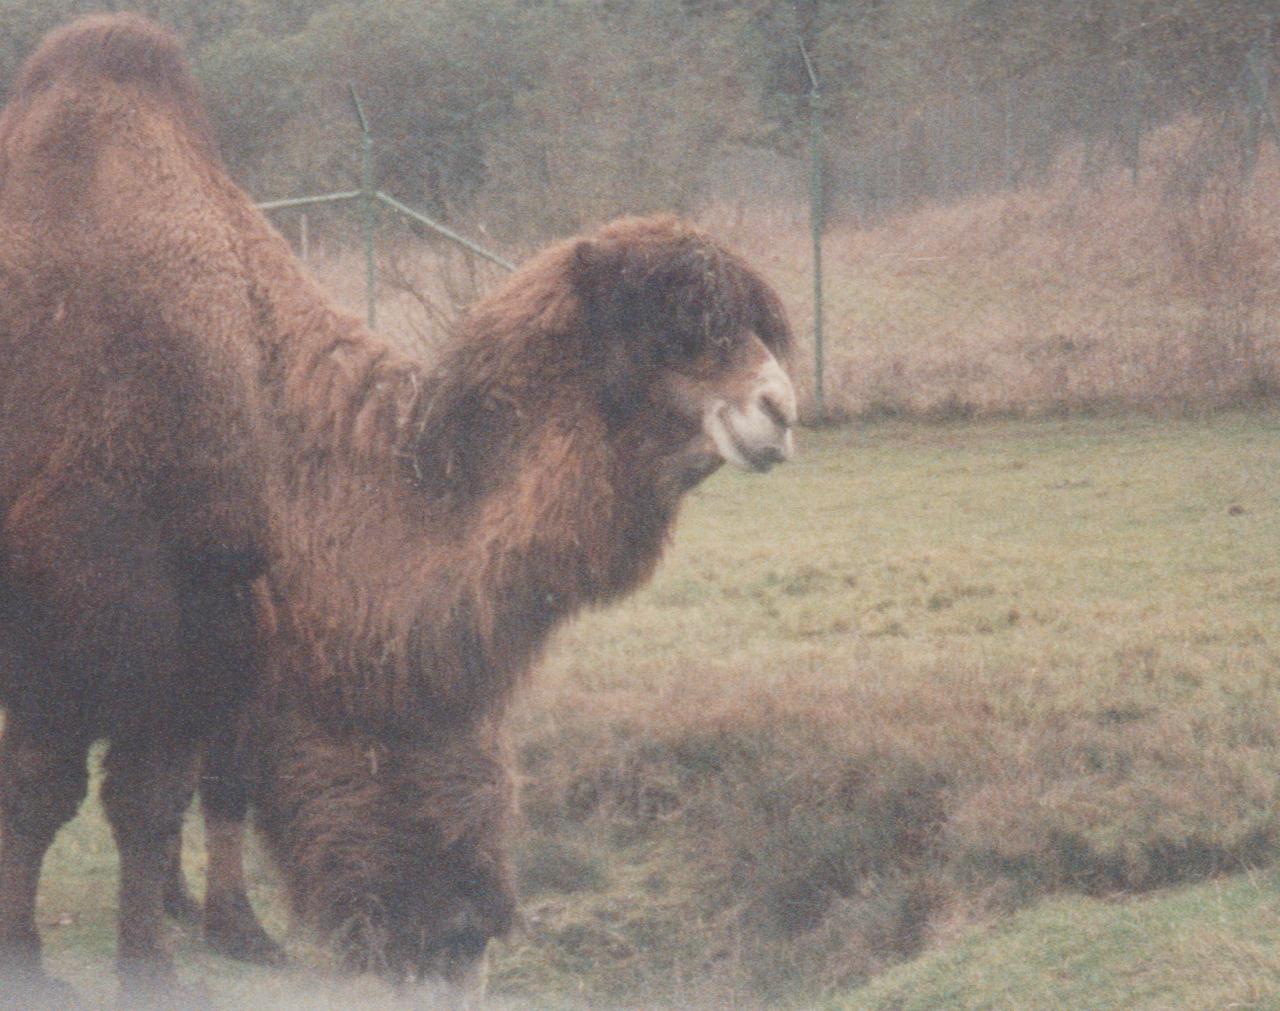 1992-12-26 - Saturday - Wildlife Safari Trip, Marilyn, Crystal-18.png